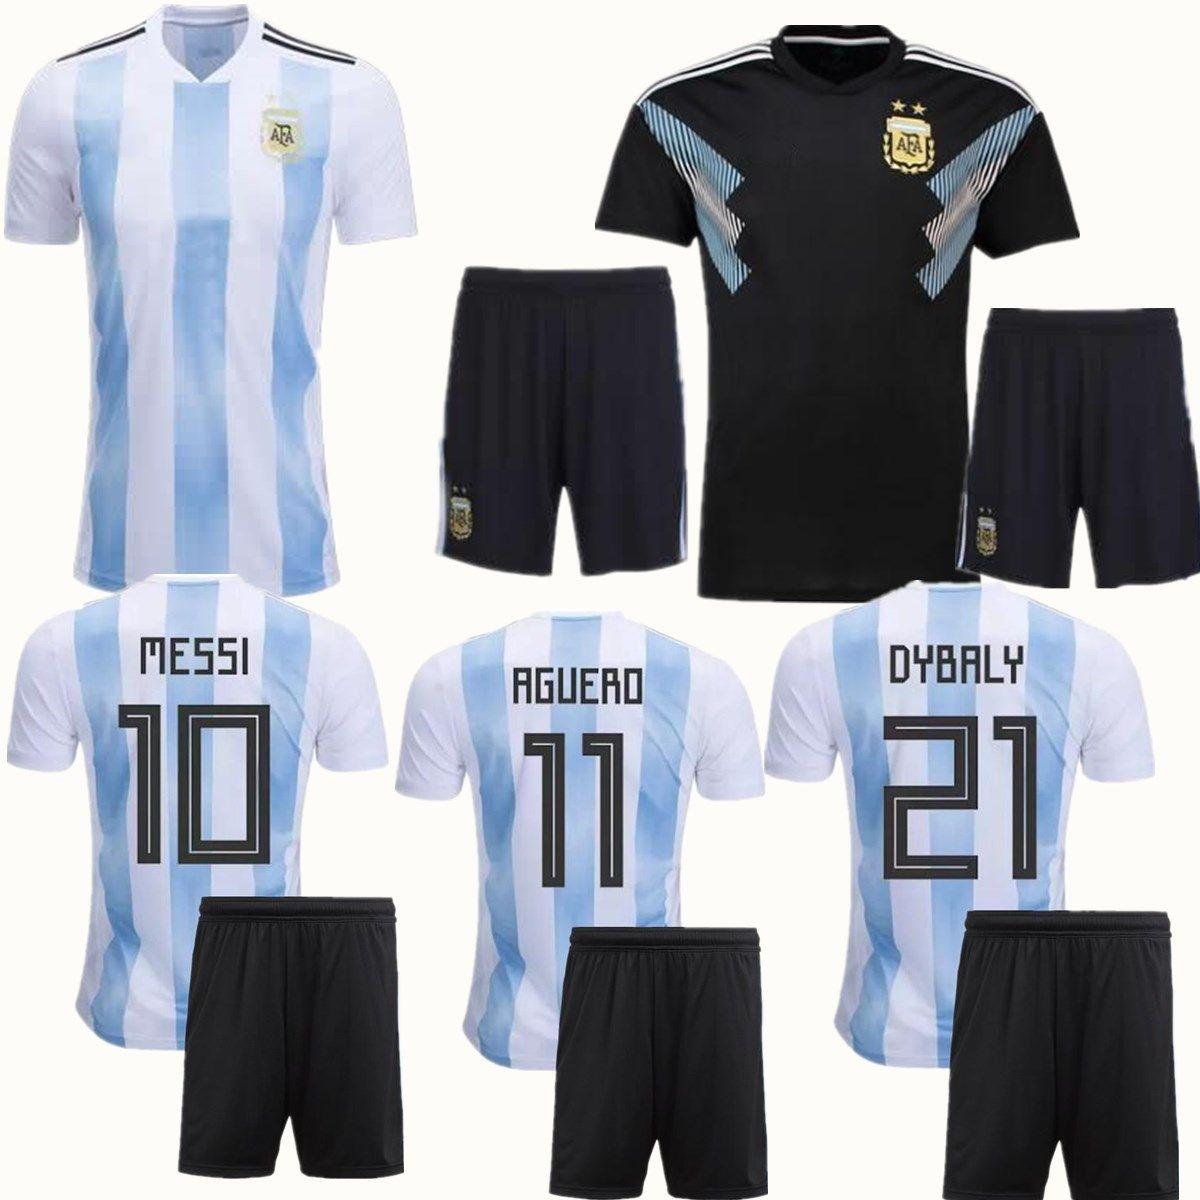 Compre Copa Del Mundo 2018 Conjuntos De Fútbol De Visitante De Argentina  MESSI DI MARIA AGUERO KOMPANY DYBALA Maillot Negro Equipación De Adultos  Uniforme ... 36990e3ddb012